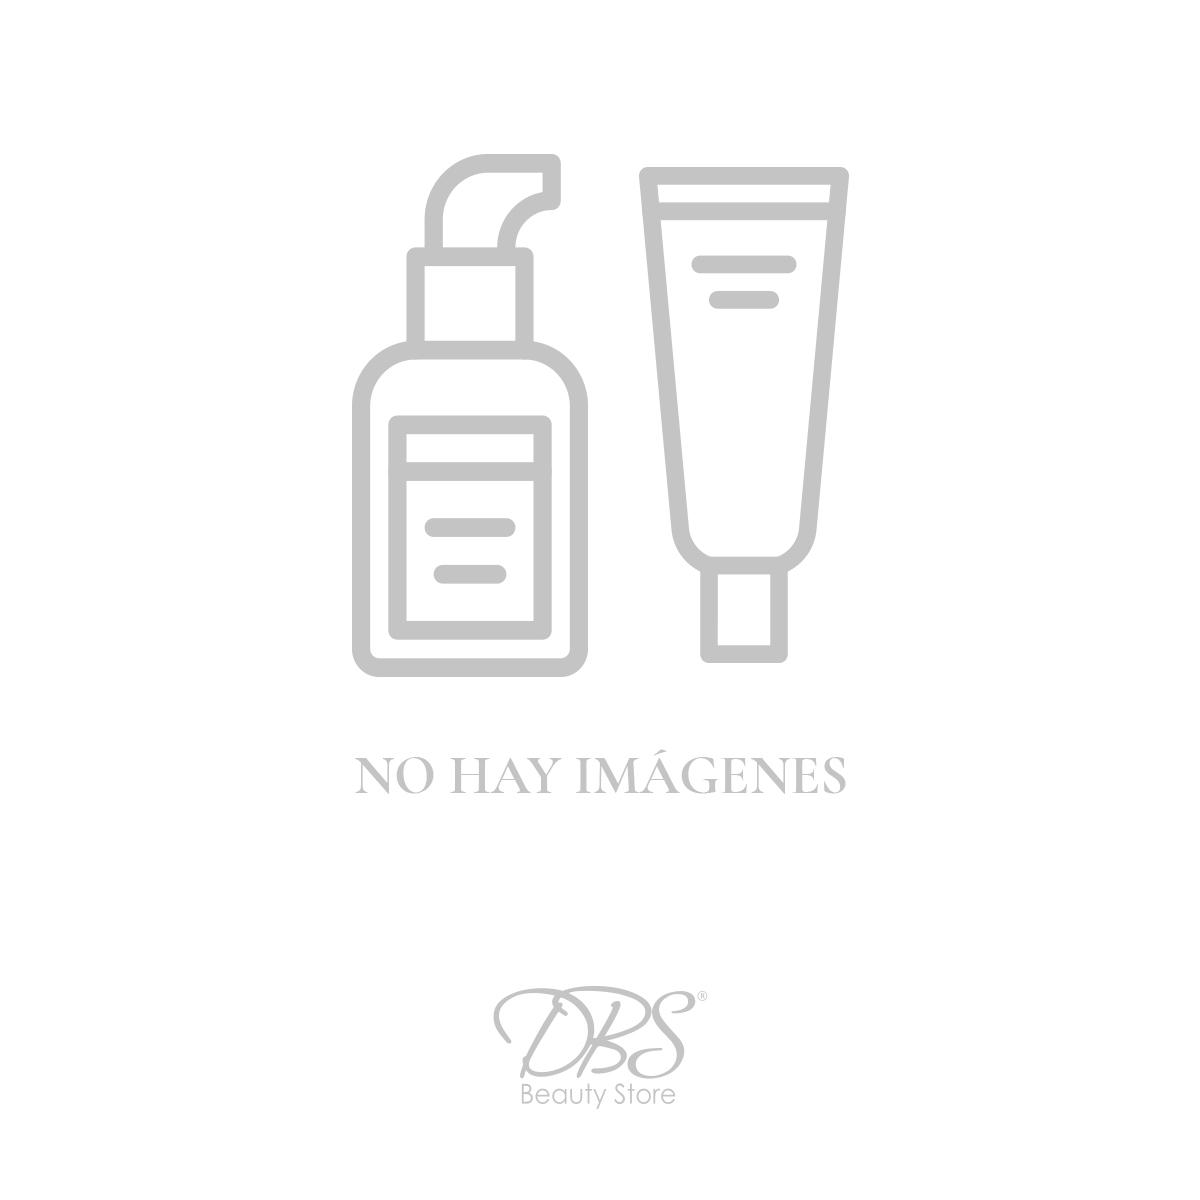 Shampoo Limpieza Profunda Hair Cleansing Cream